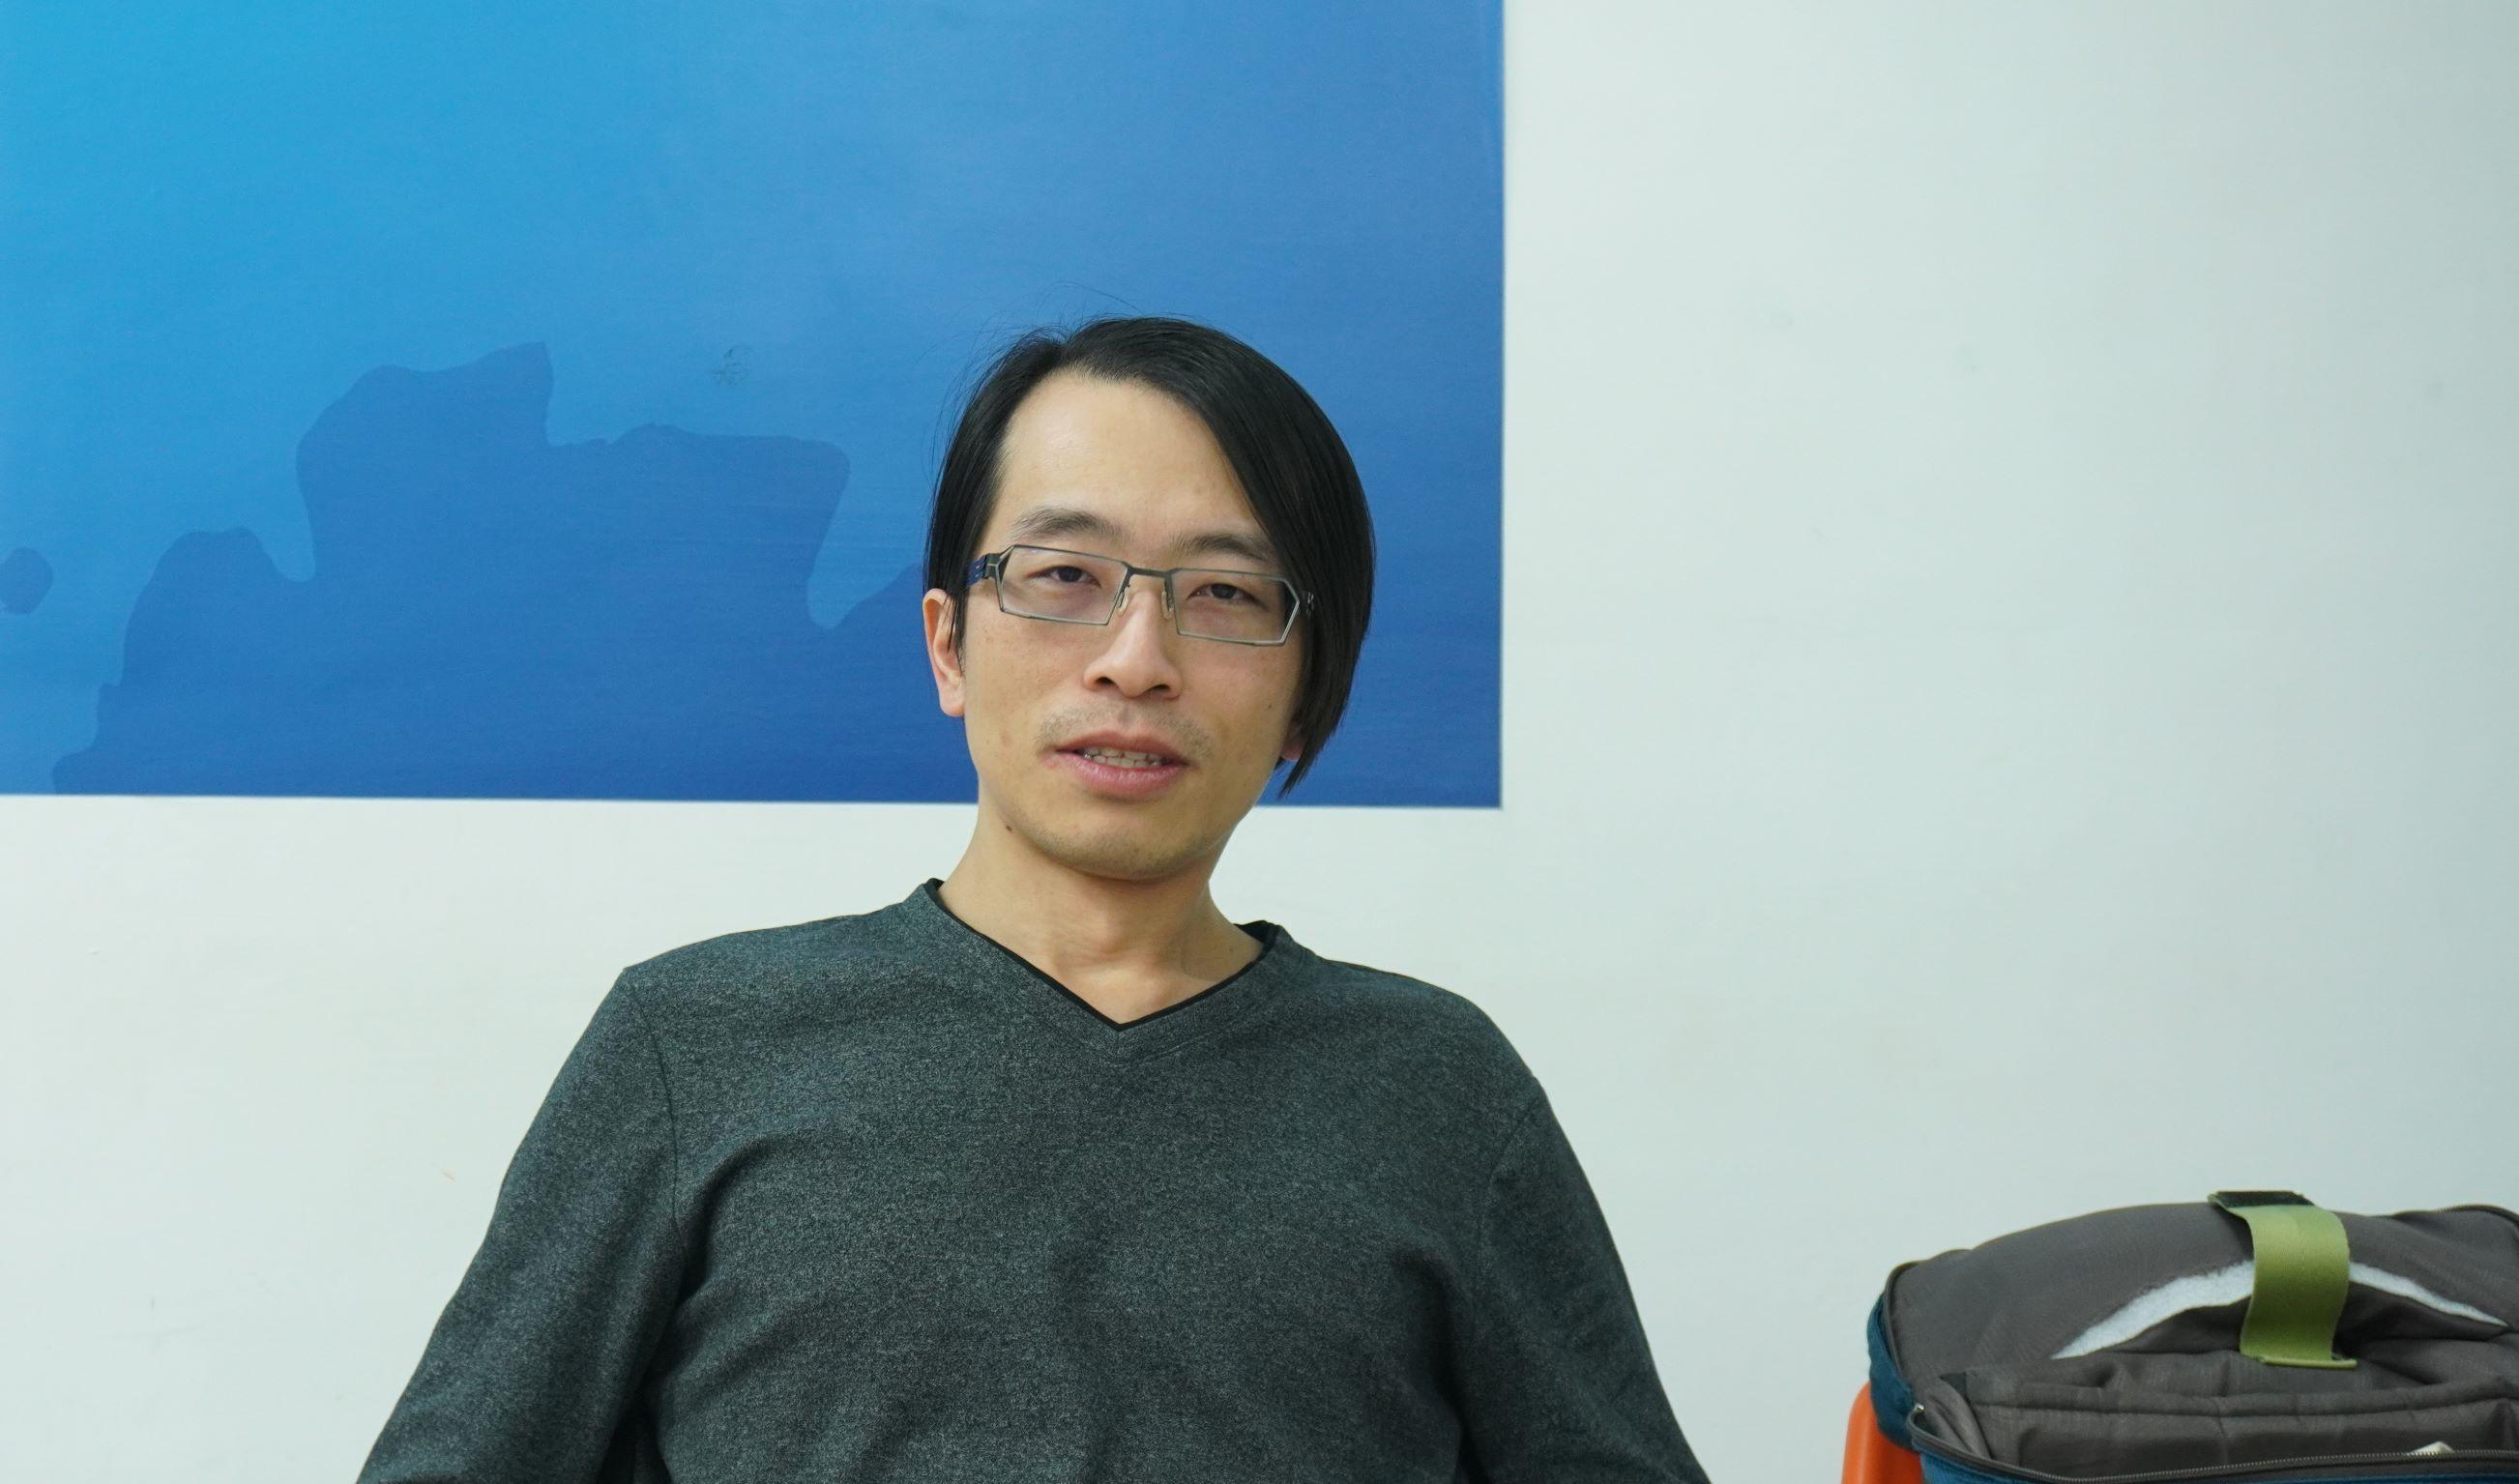 ▲Mozilla臺灣社群負責人Irvin Chen暢談台灣未來數位發展。攝影/彭 宬